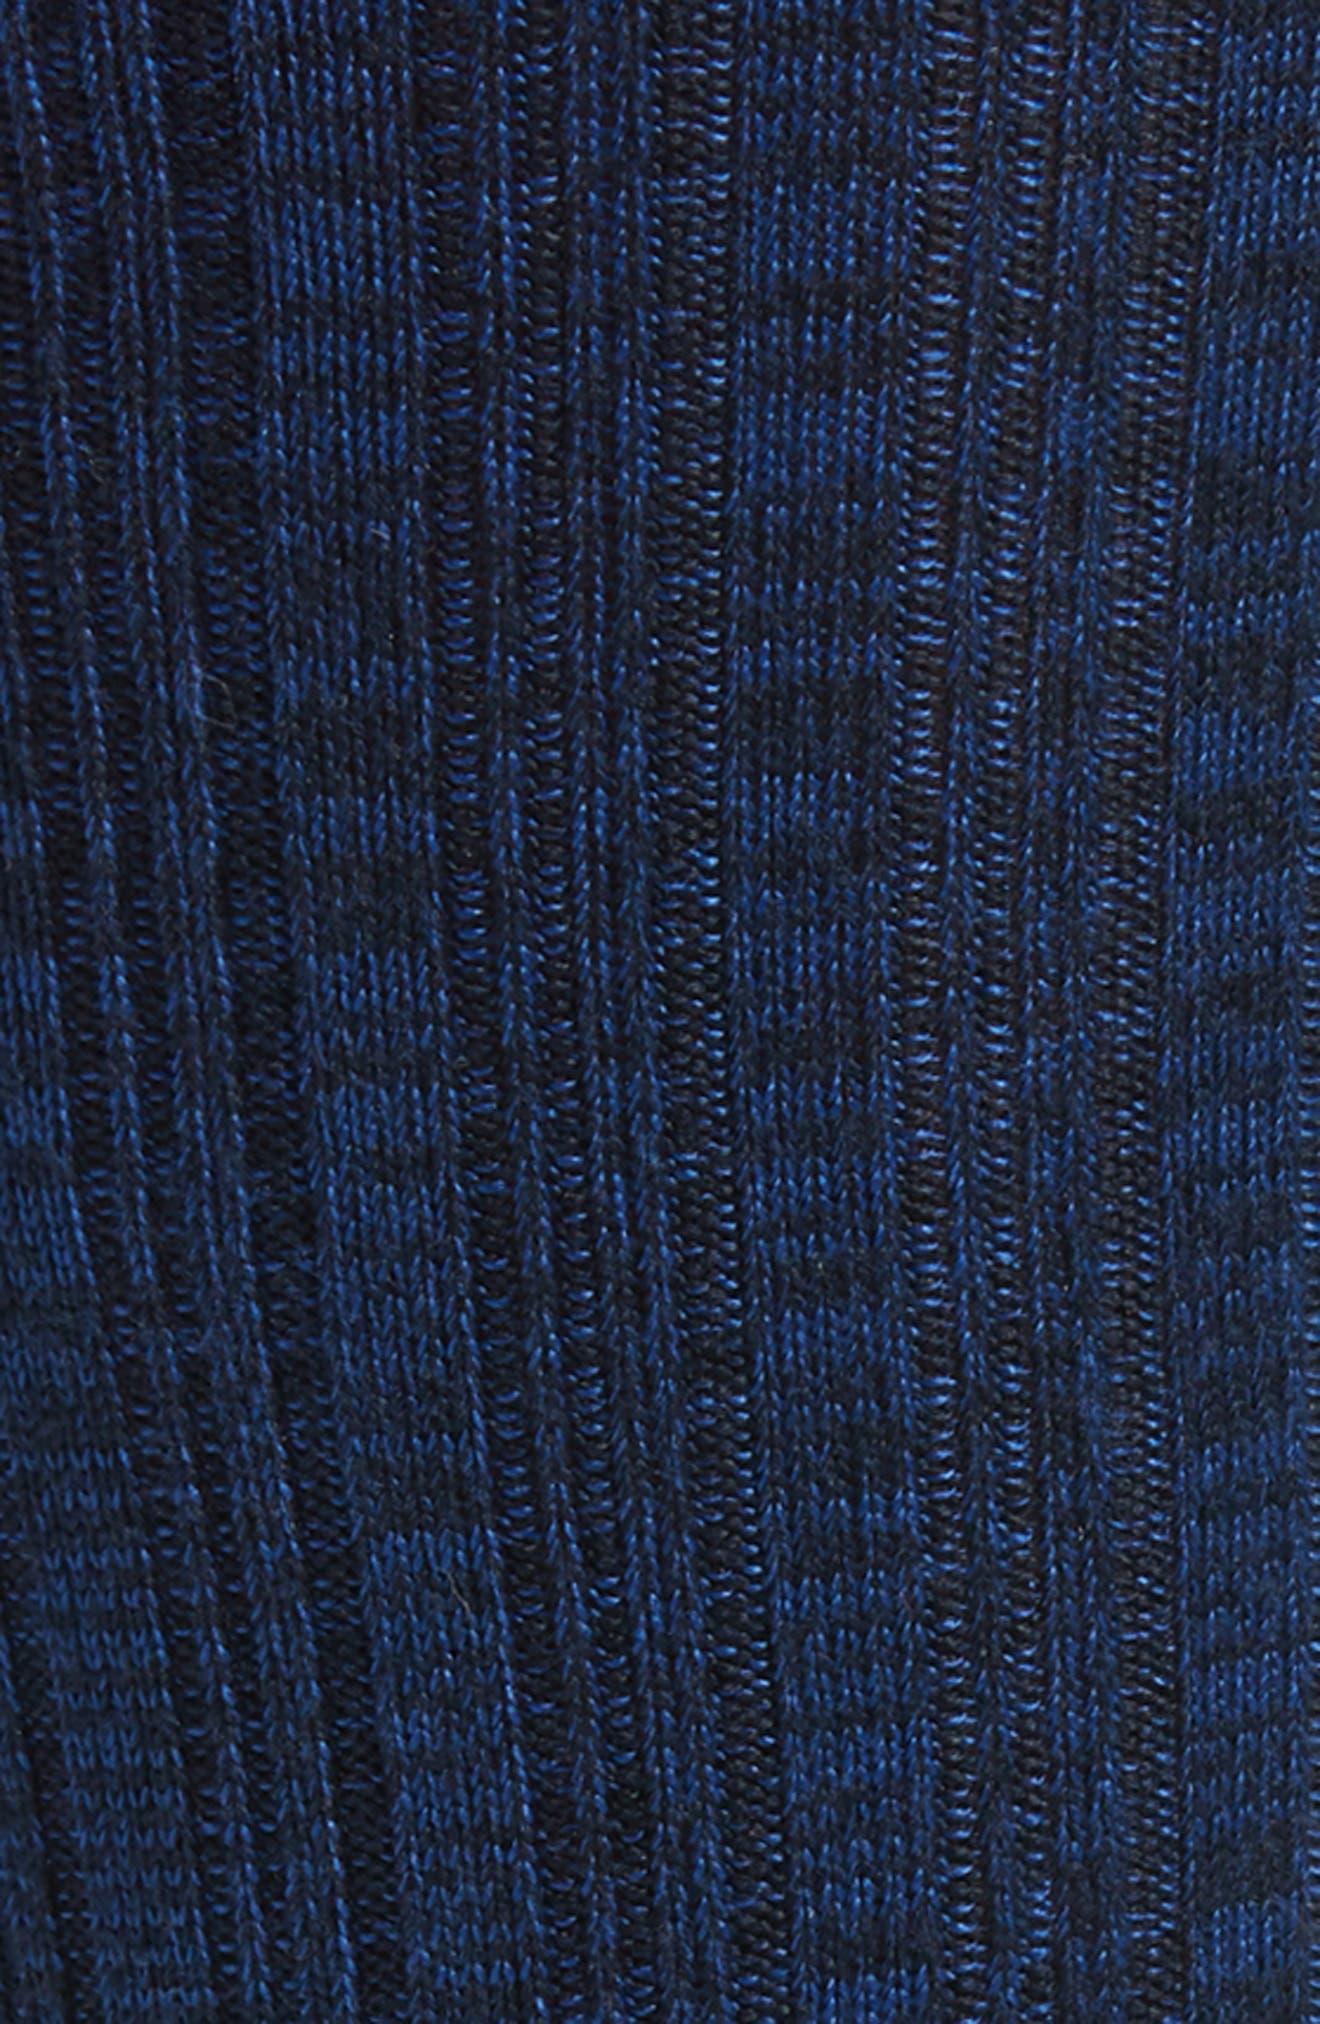 Variegated Ribbed Ultrasoft Socks,                             Alternate thumbnail 2, color,                             NAVY MARL